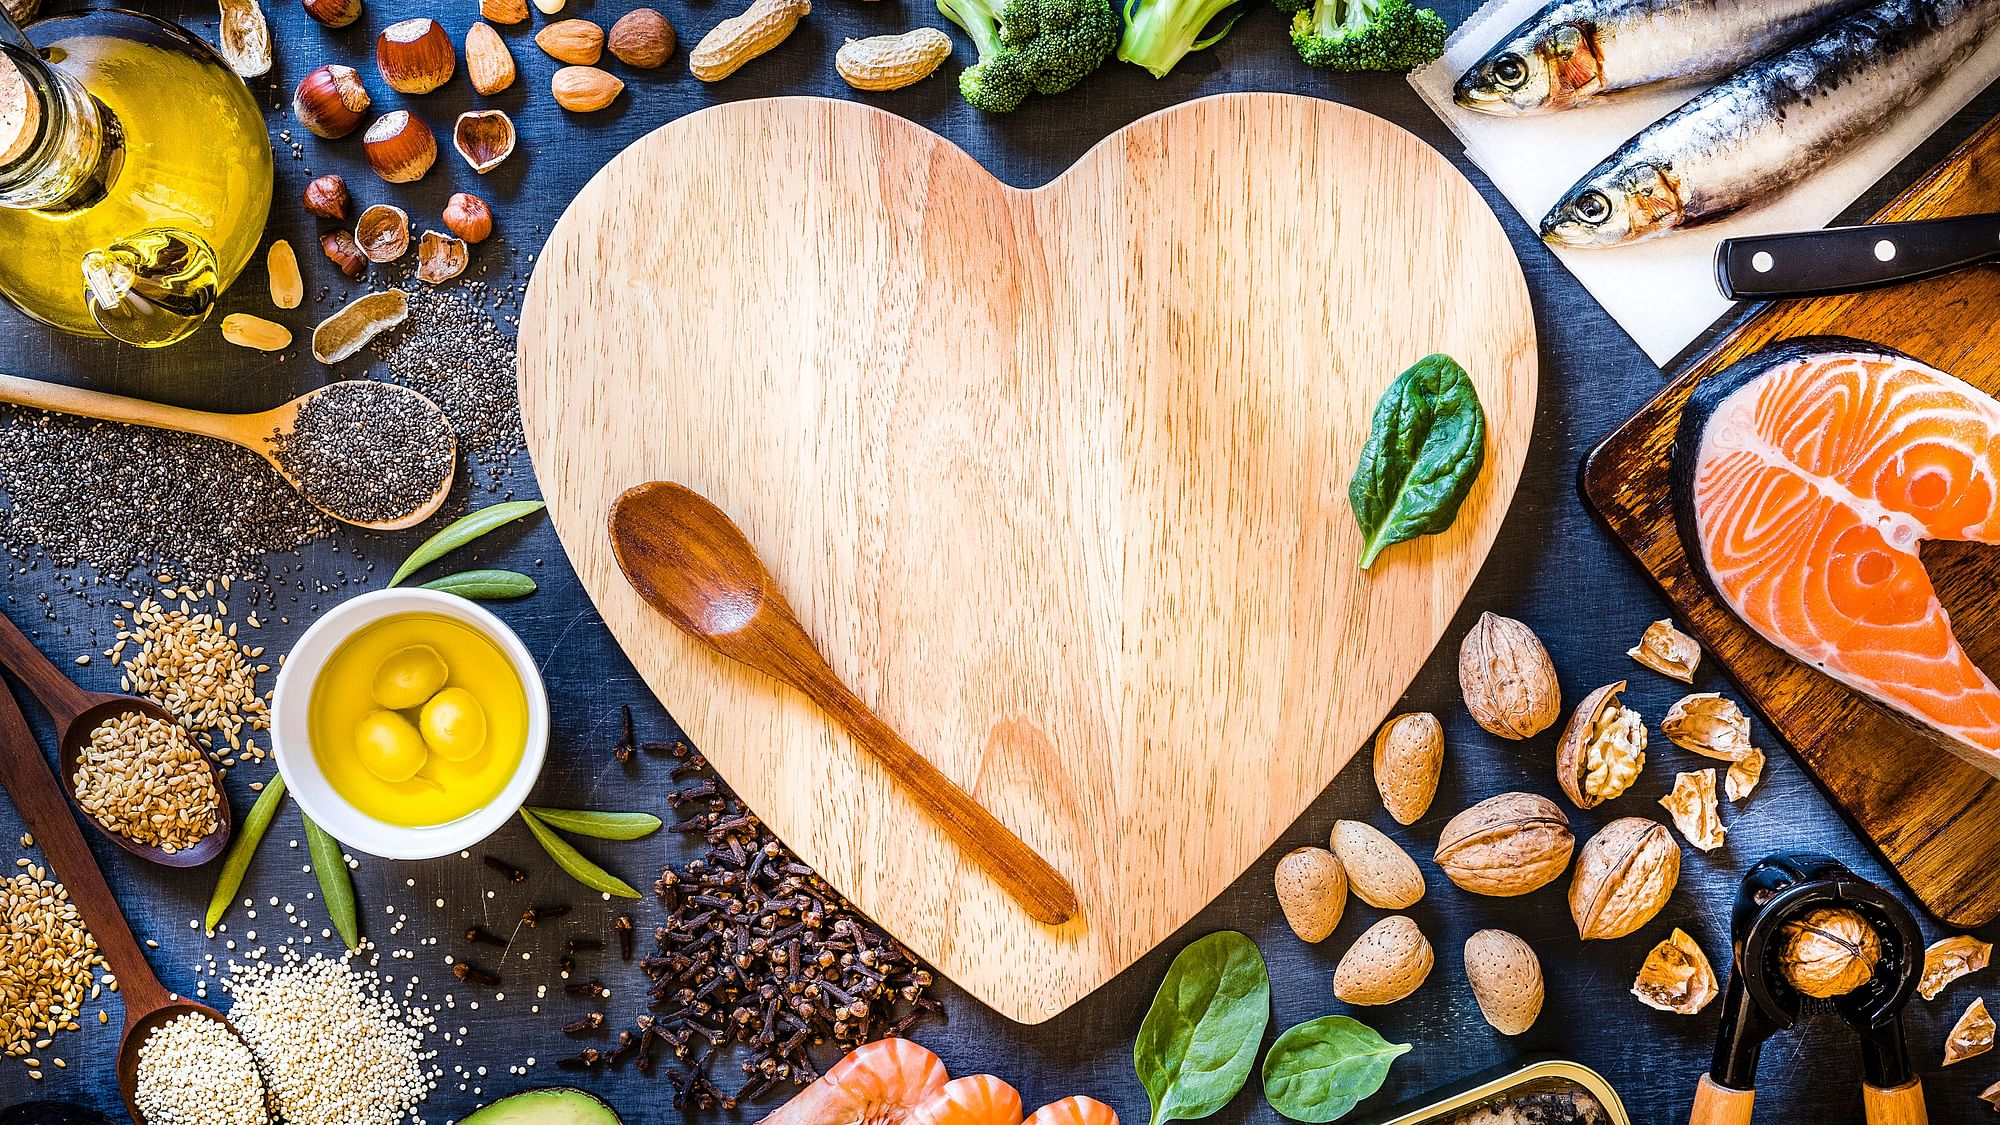 Health experts said that taking natural antioxidants may help keep the heart healthy.